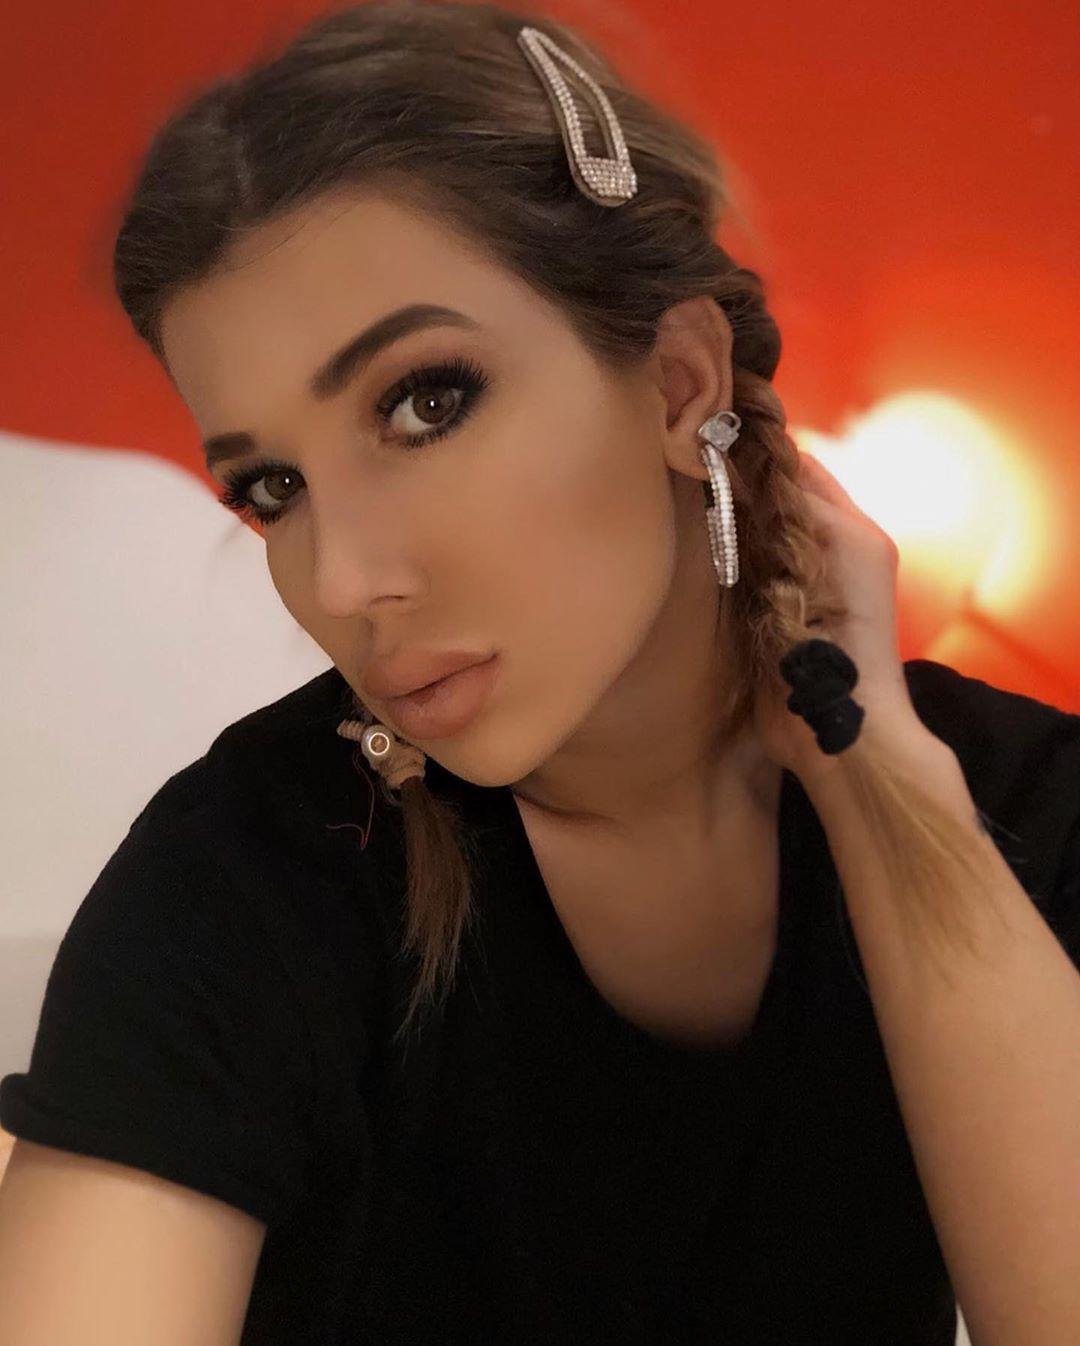 Bianca Dobroiu akhirnya dinyatakan negatif corona usai dua bulan lebih dirawat